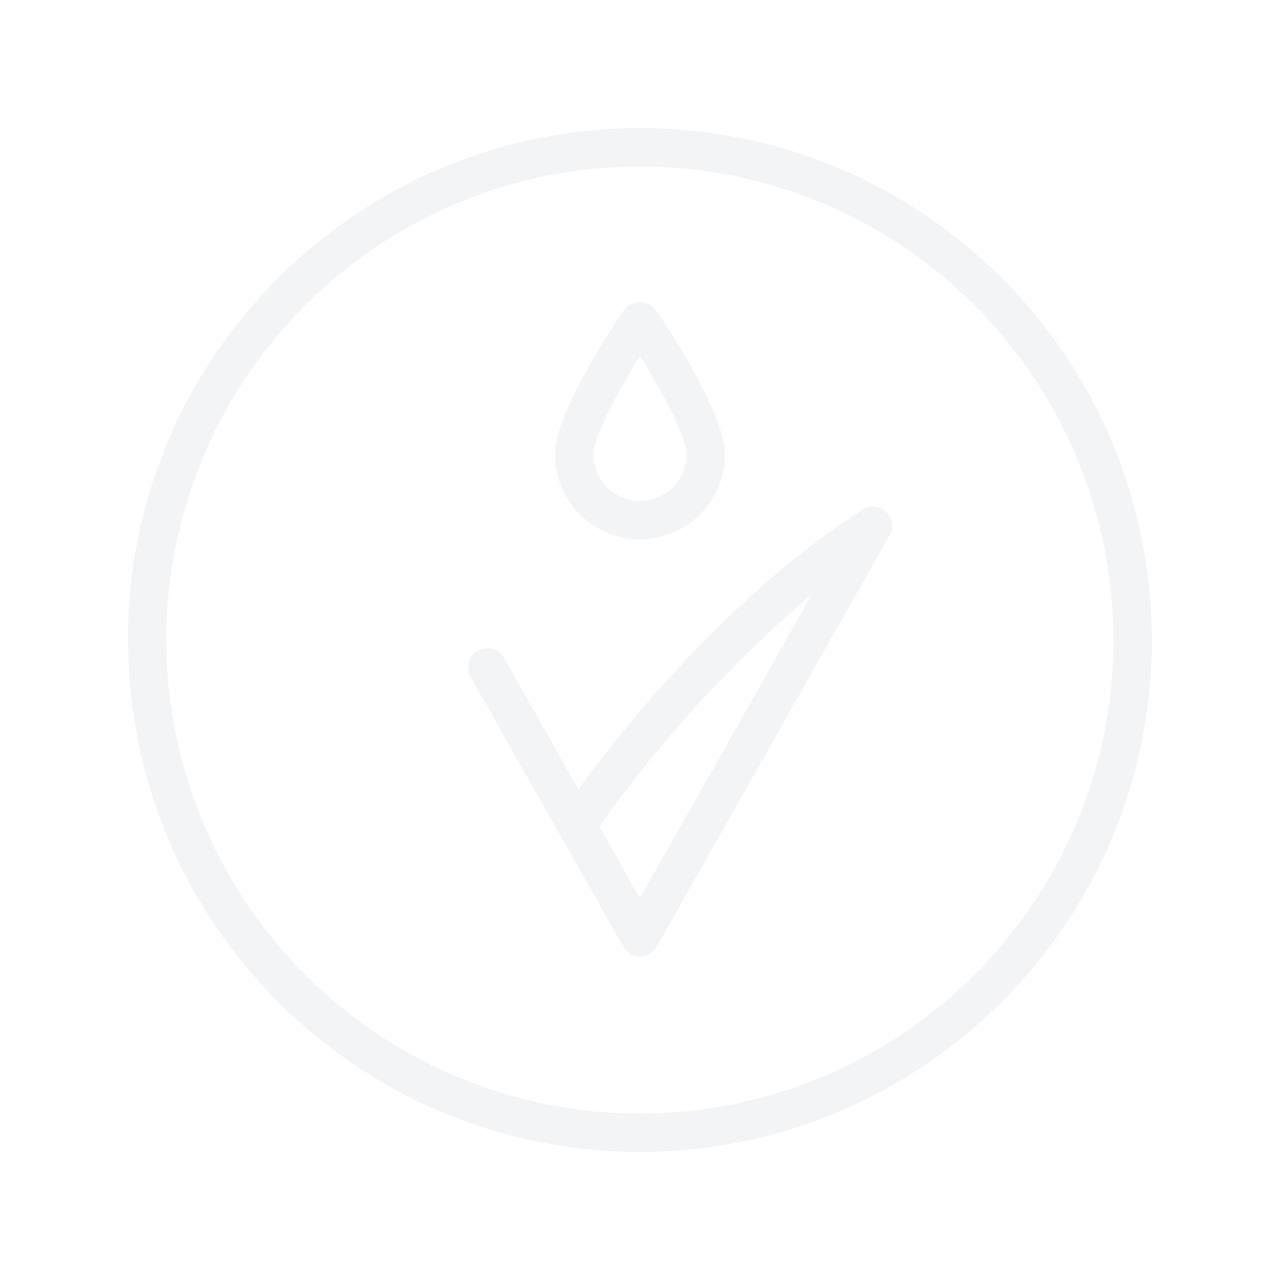 HOLIKA HOLIKA Pig-Nose Clear Black Head 3-Step Kit (No Water) 6.5g